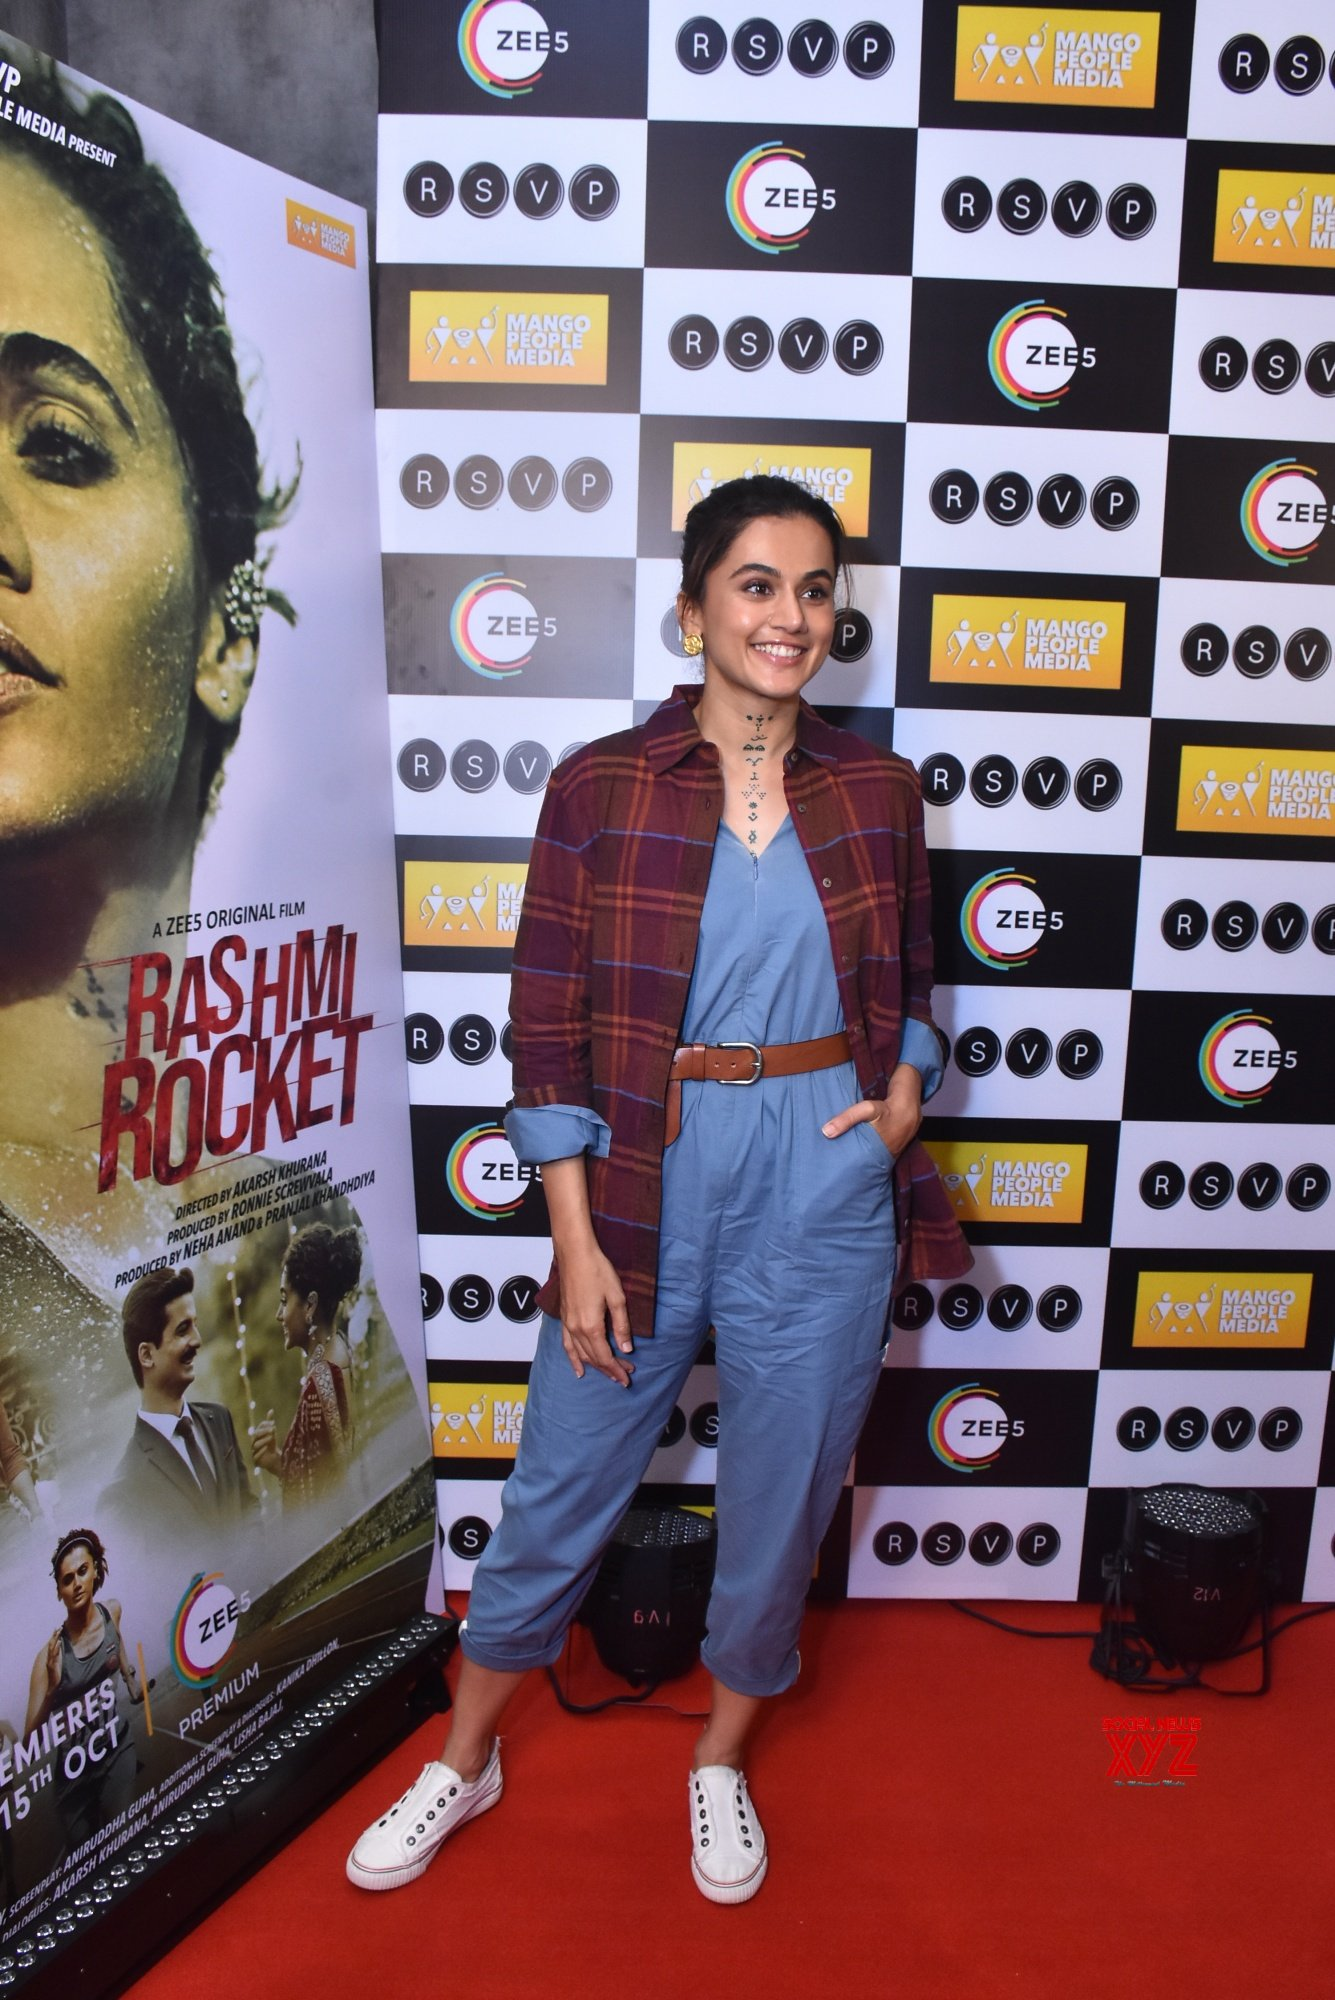 Rashmi Rocket Movie Red Carpet Event - Gallery